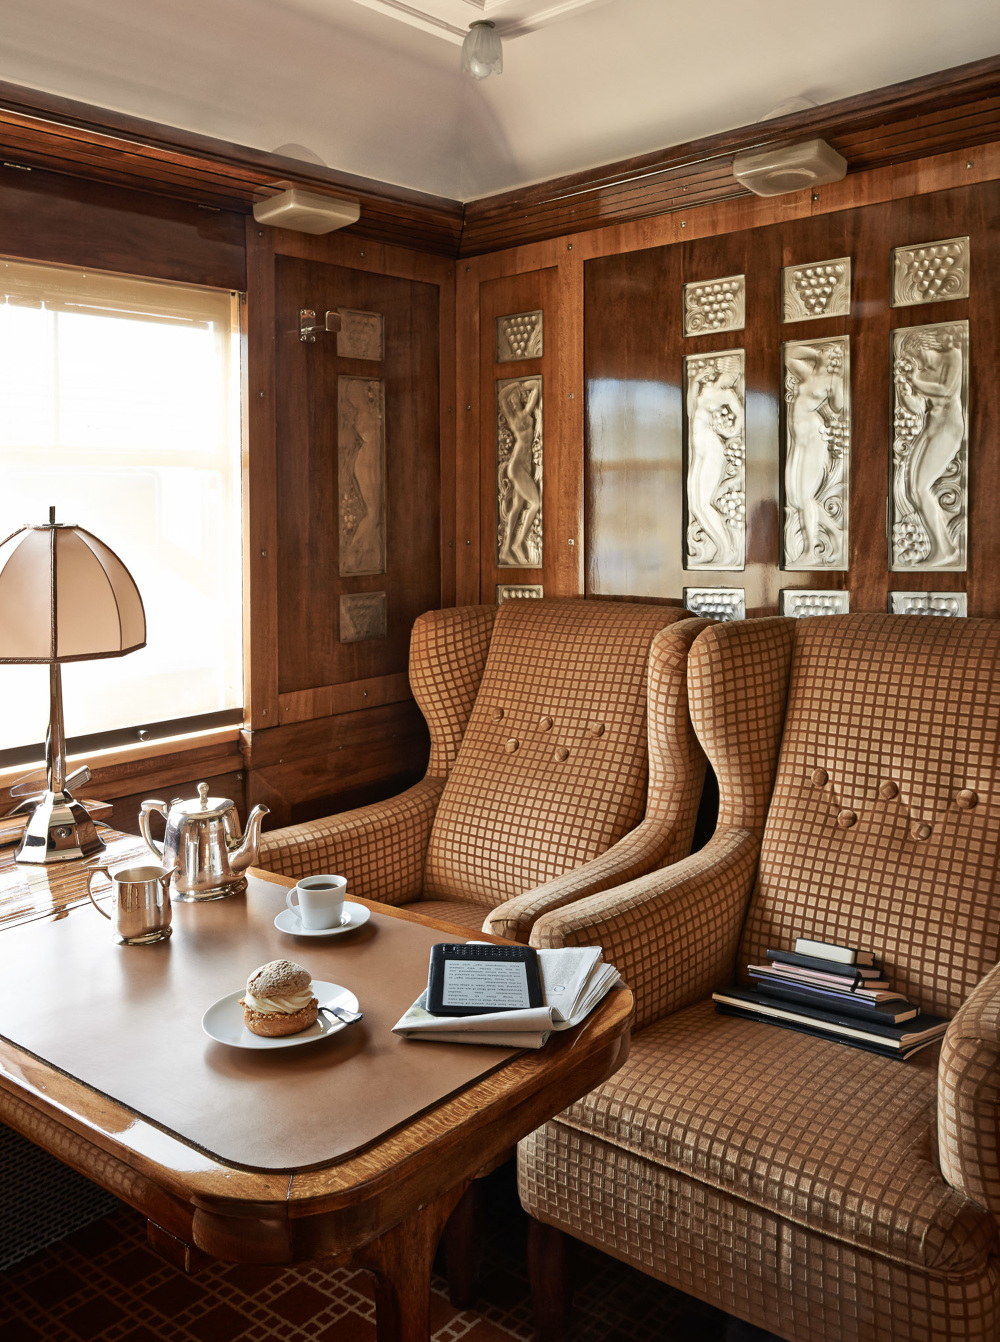 orient express sandrineplace. Black Bedroom Furniture Sets. Home Design Ideas